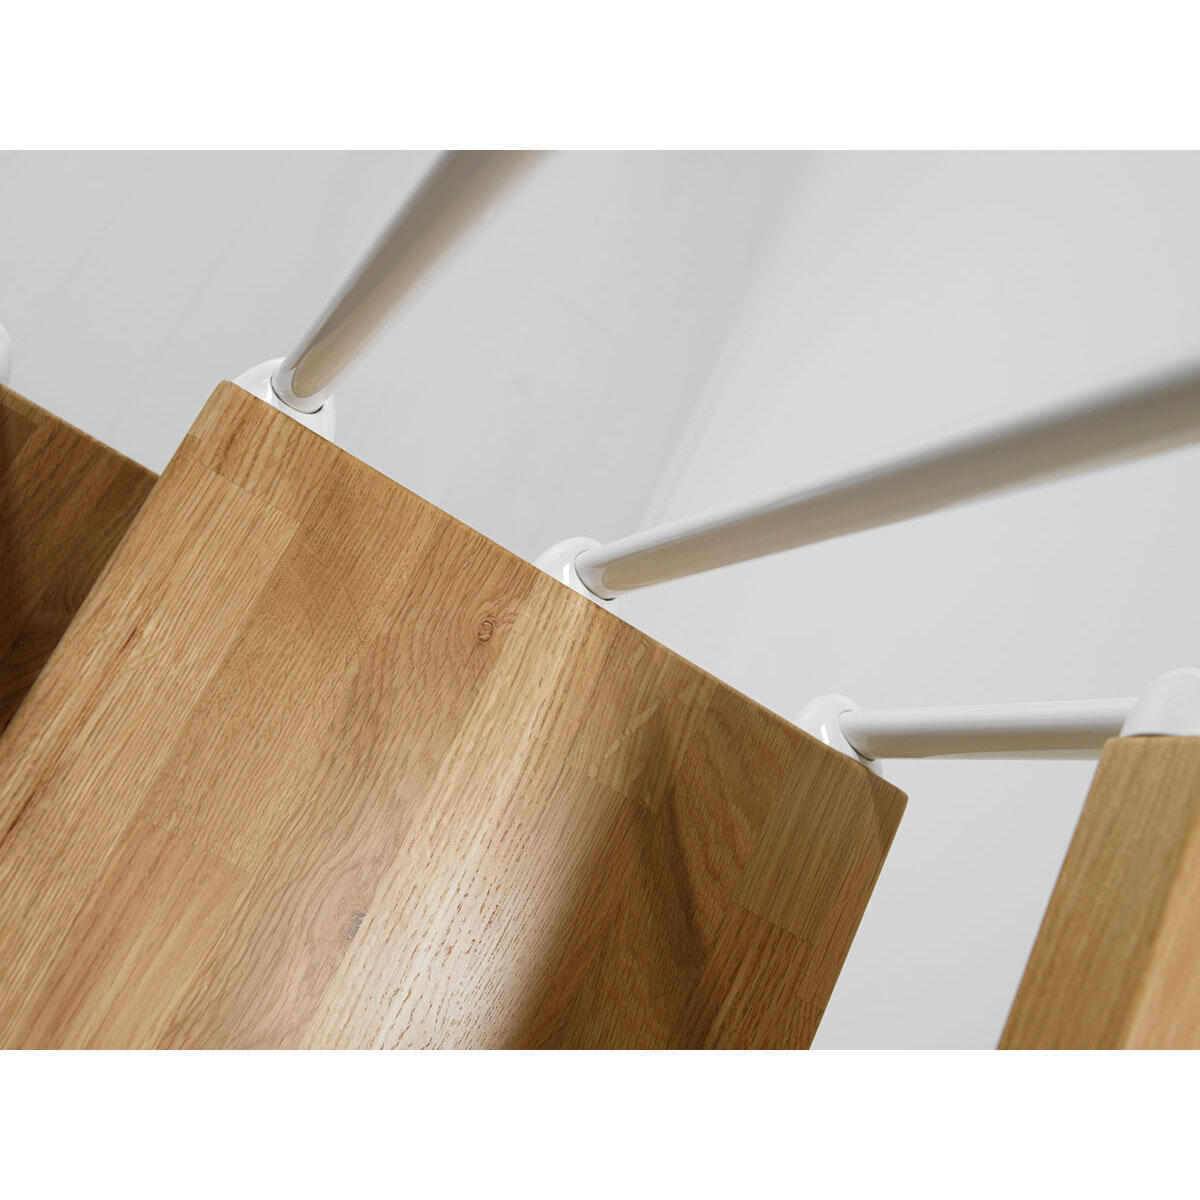 Scala a rampa due quarti di giro OAK90 FONTANOT L 70 cm, gradino rovere, struttura bianco - 5